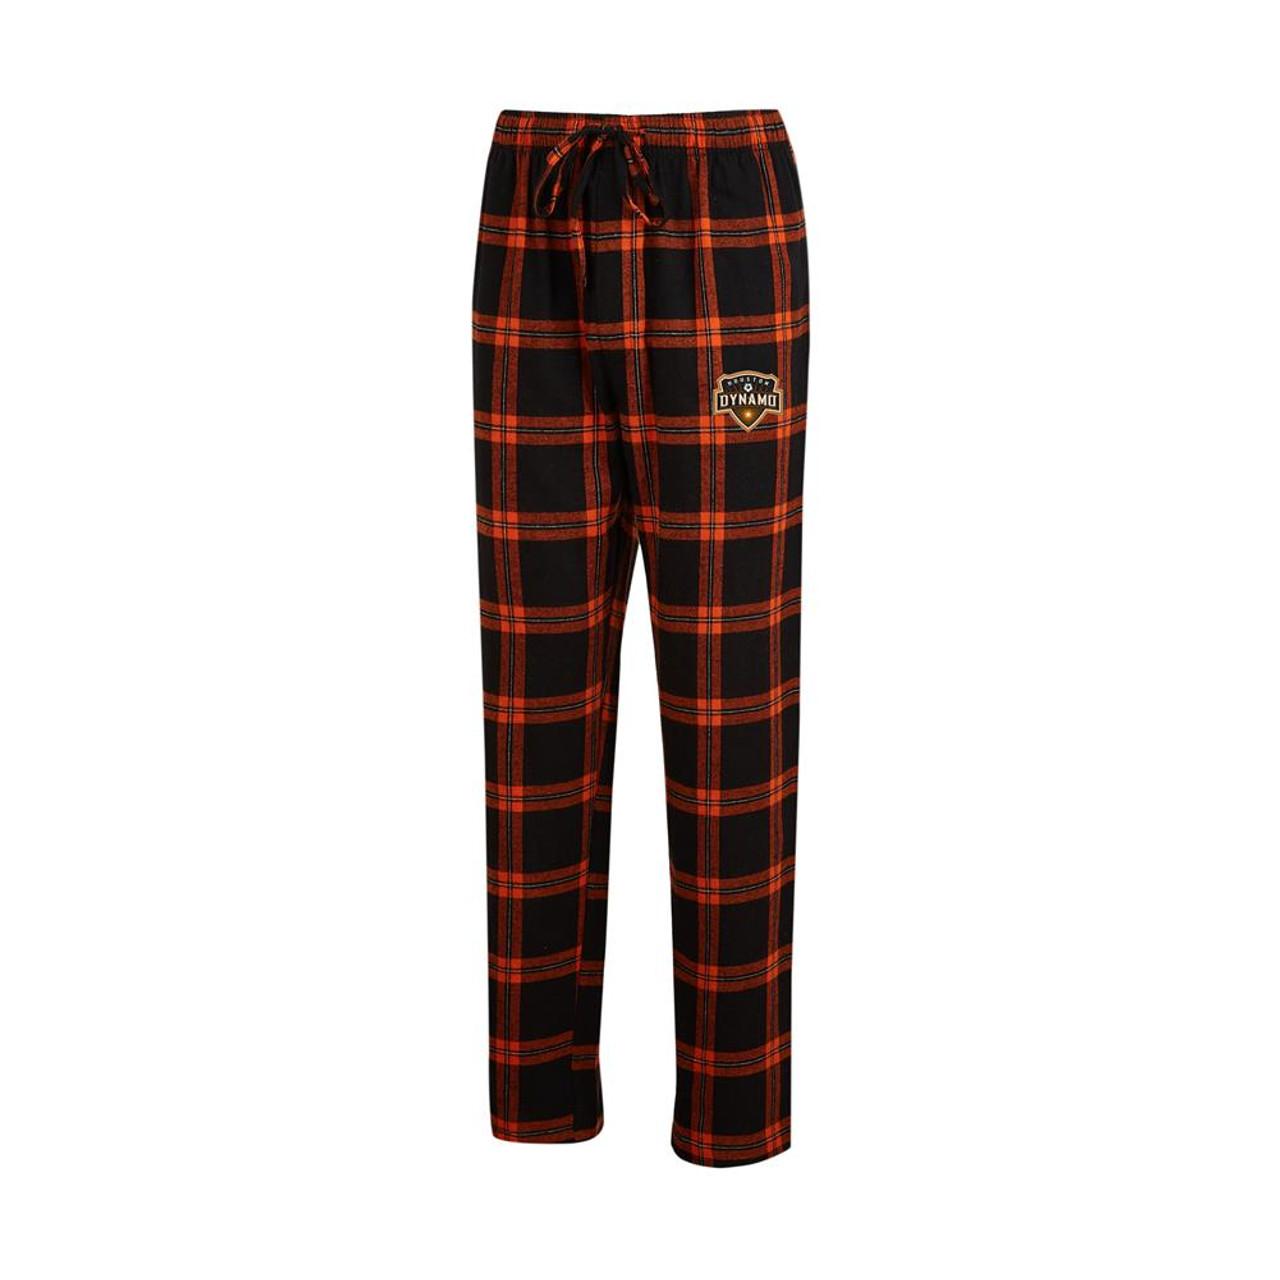 Houston Dynamo Men's Pajama Pants Plaid Pajama Bottoms